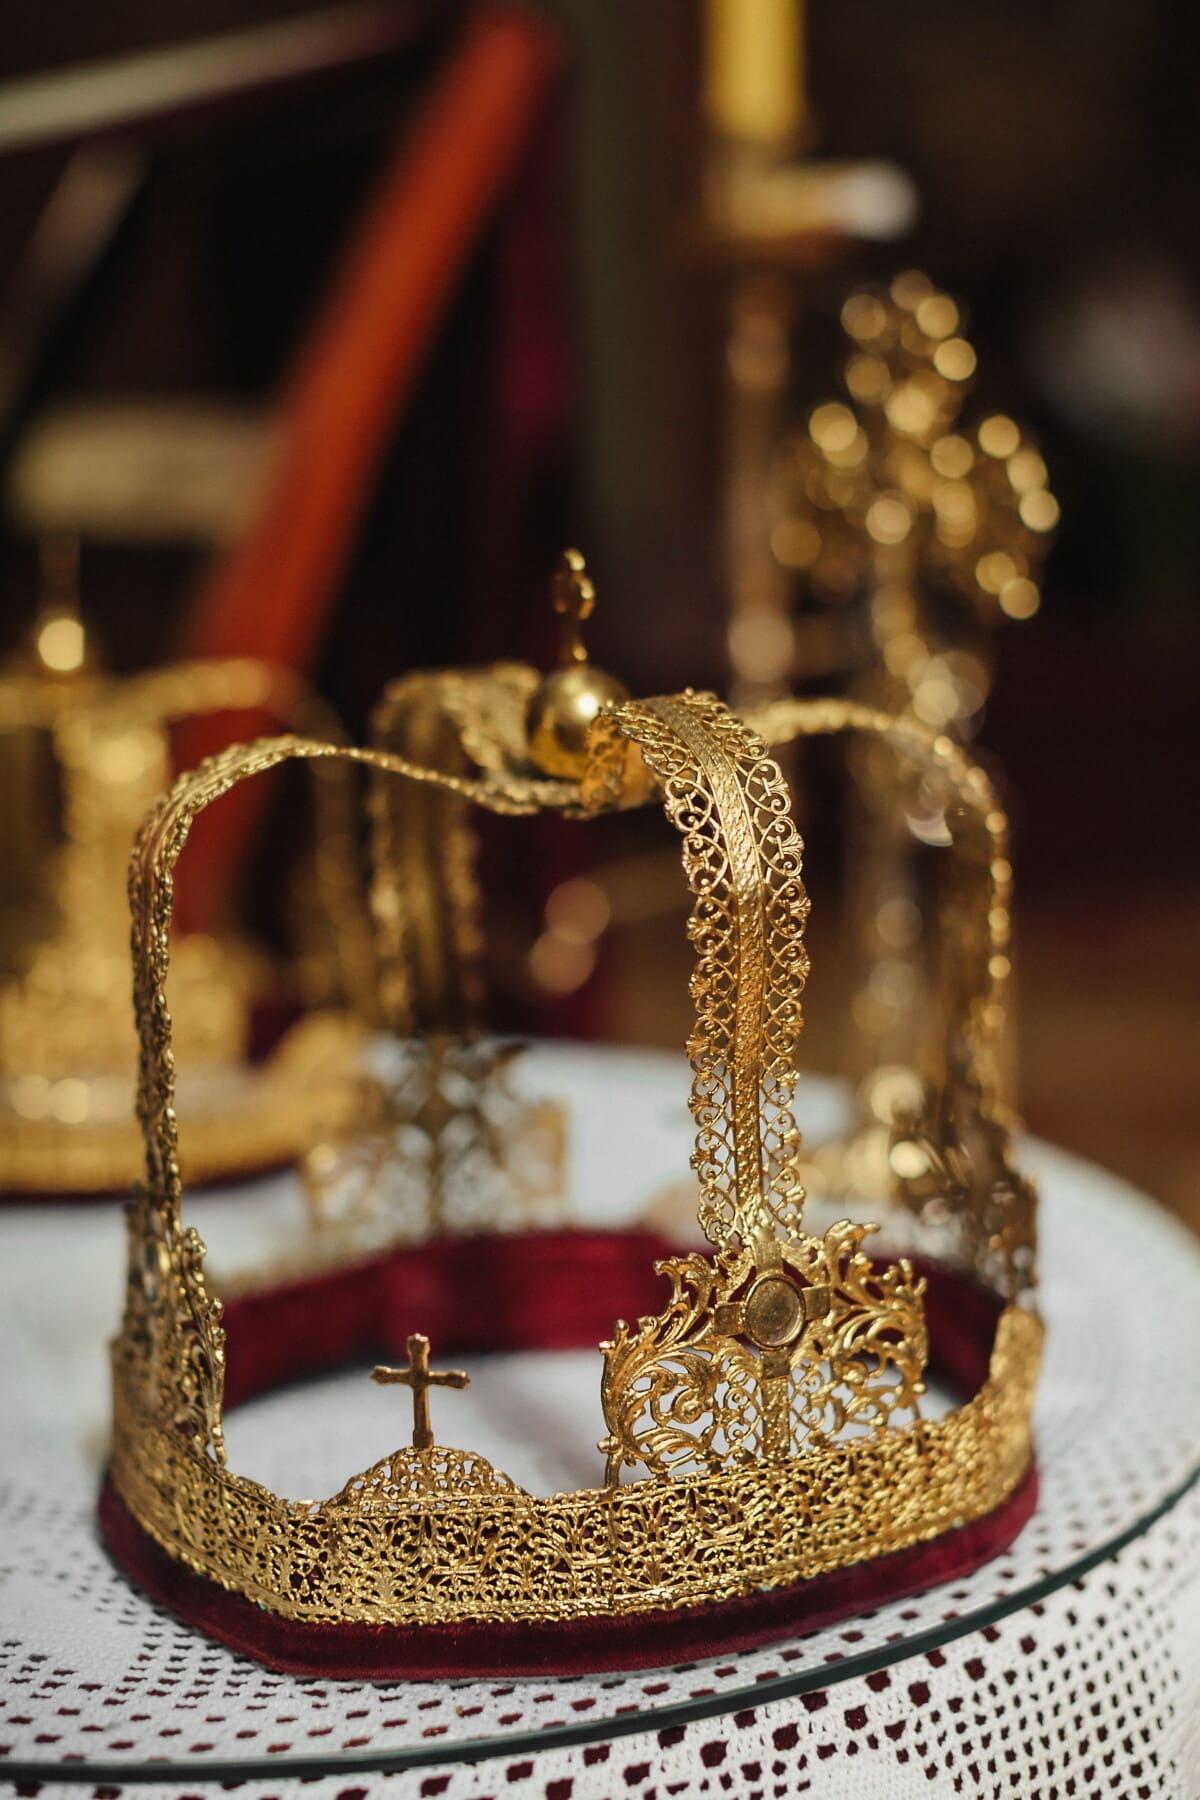 gold, crown, royalty, kingdom, luxury, shining, jewelry, decoration, elegant, traditional